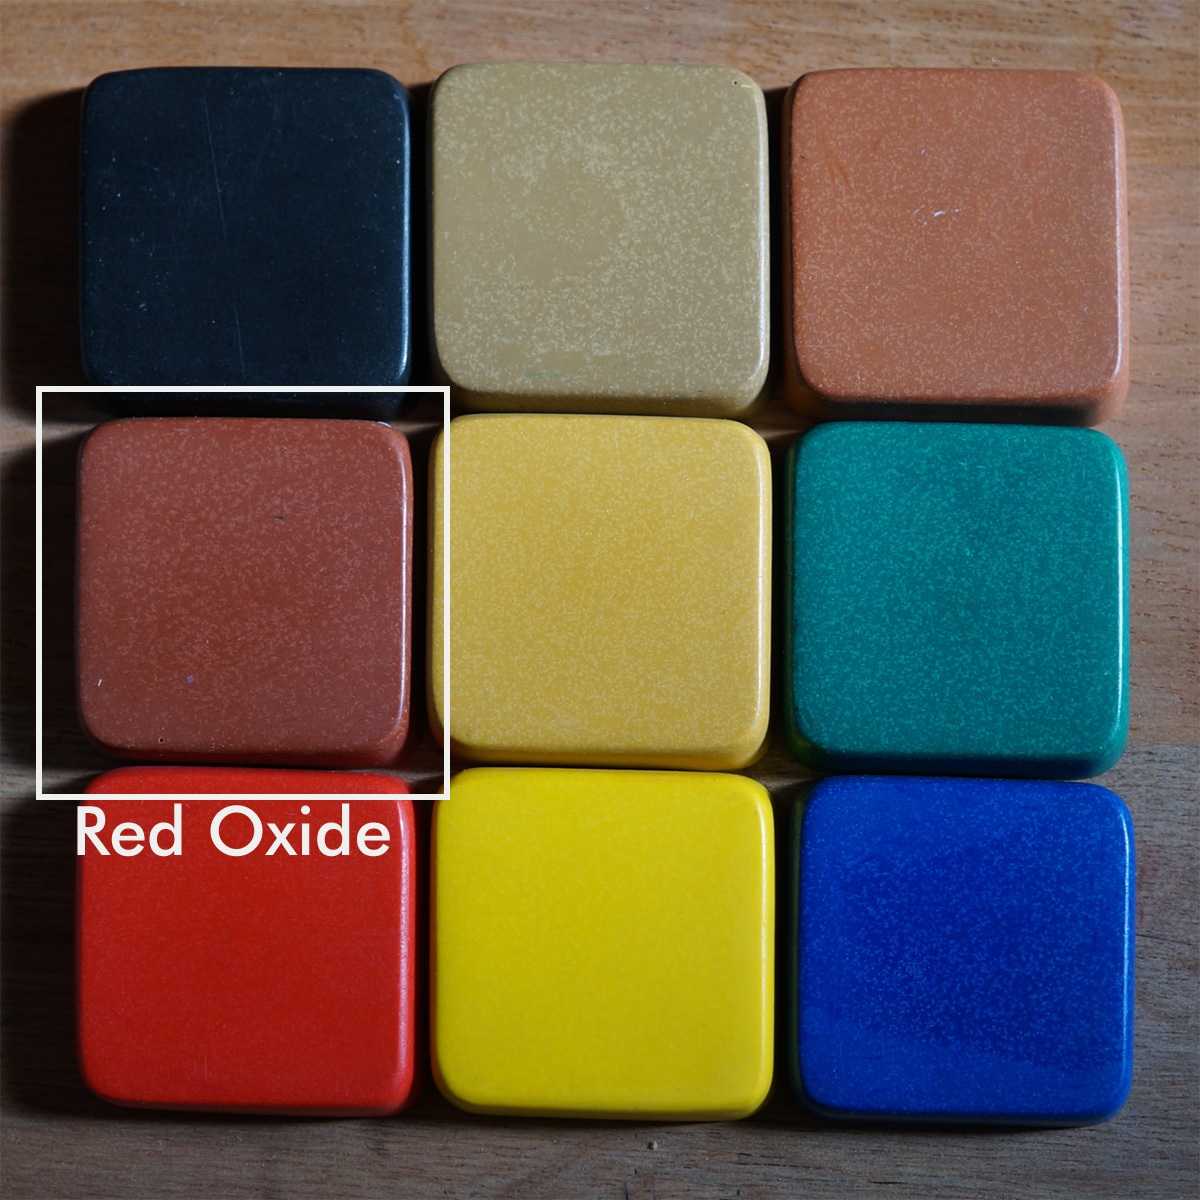 PIGMENT RED OXIDE 300g(着色剤:レッドオキサイド 300g) - 画像2